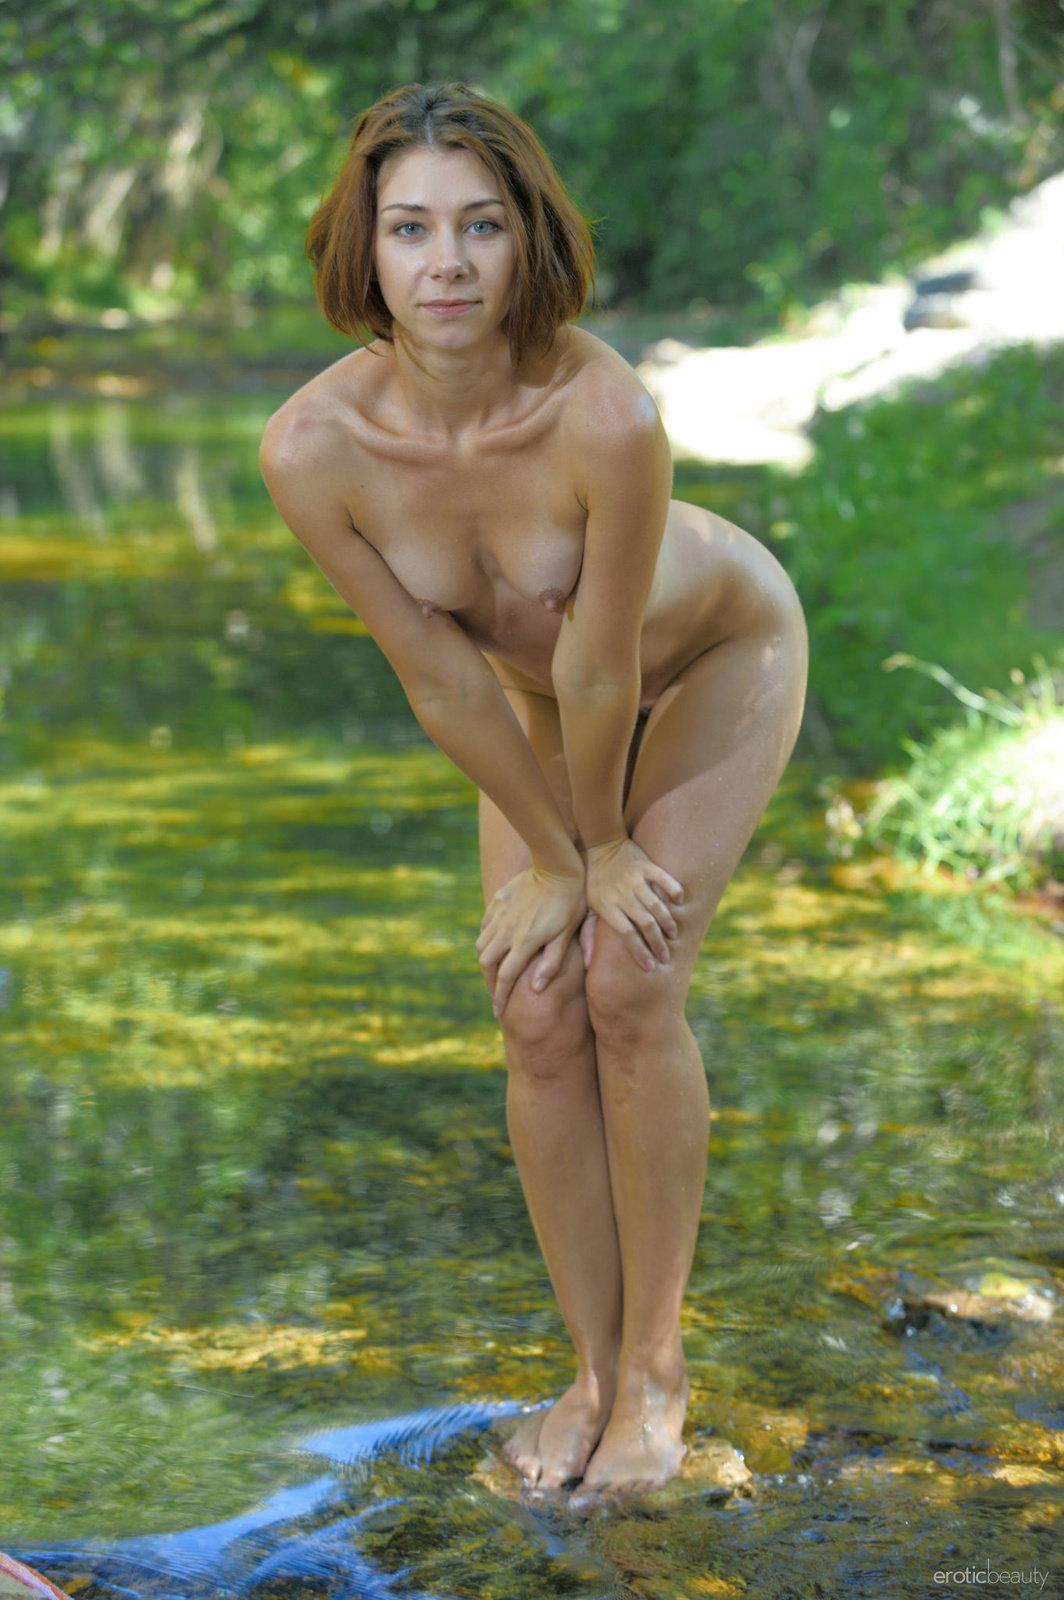 Presenting Oda By Erotic Beauty 16 Photos  Erotic Beauties-5735